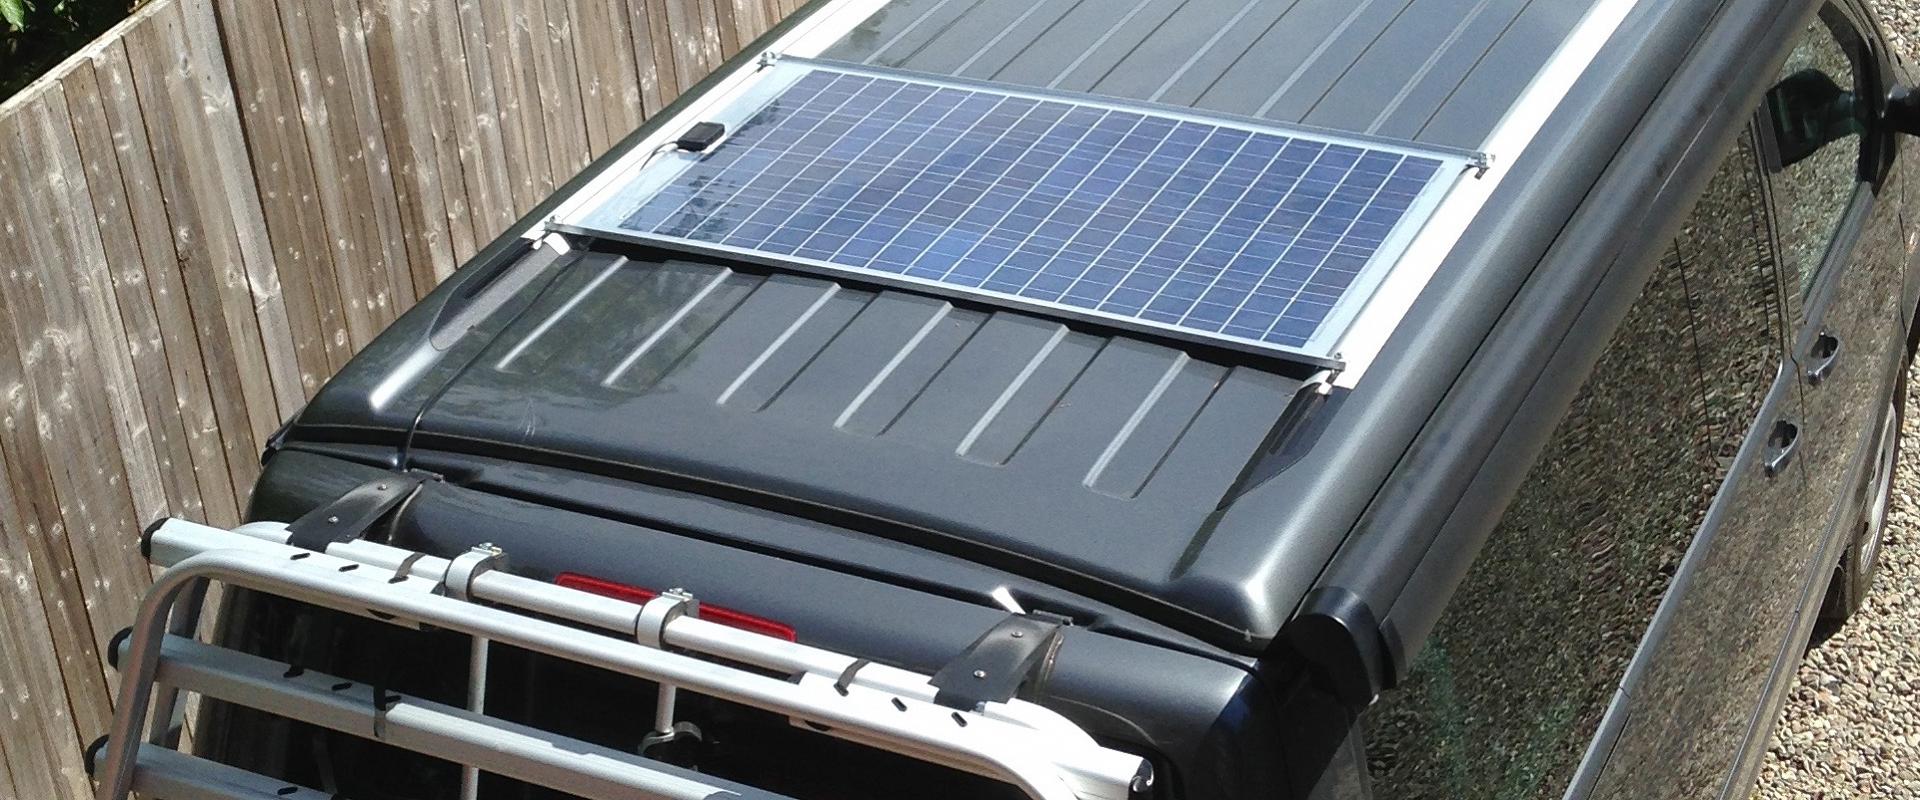 Solar Camper Solutions Home Solarpanels Solarenergy Solarpower Solargenerator Solarpanelkits Solarwaterheater Solarshing In 2020 Solar Panels Solar Solar Technology